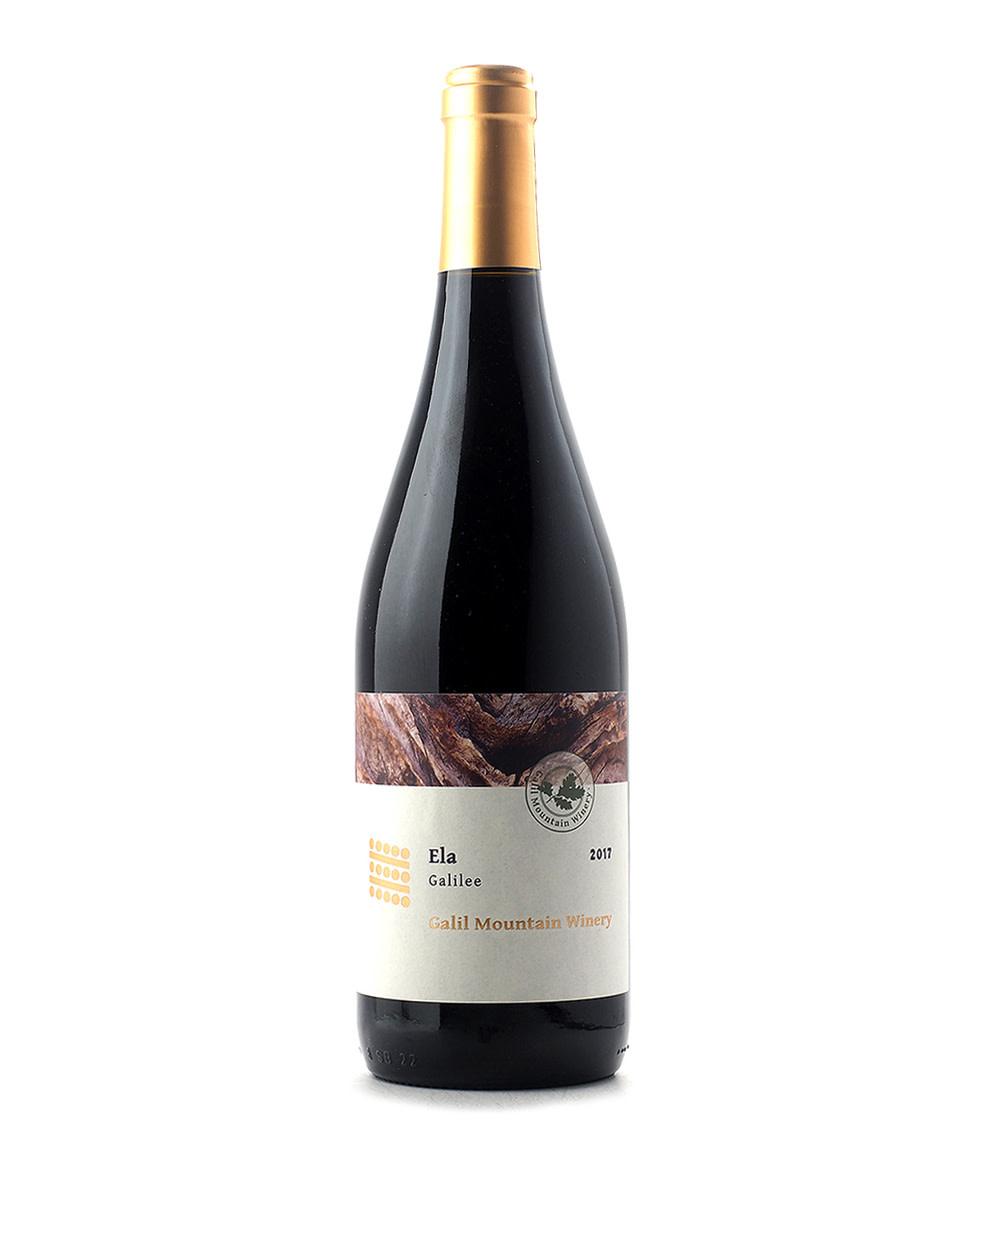 Galil Mountain Winery Ela 2016